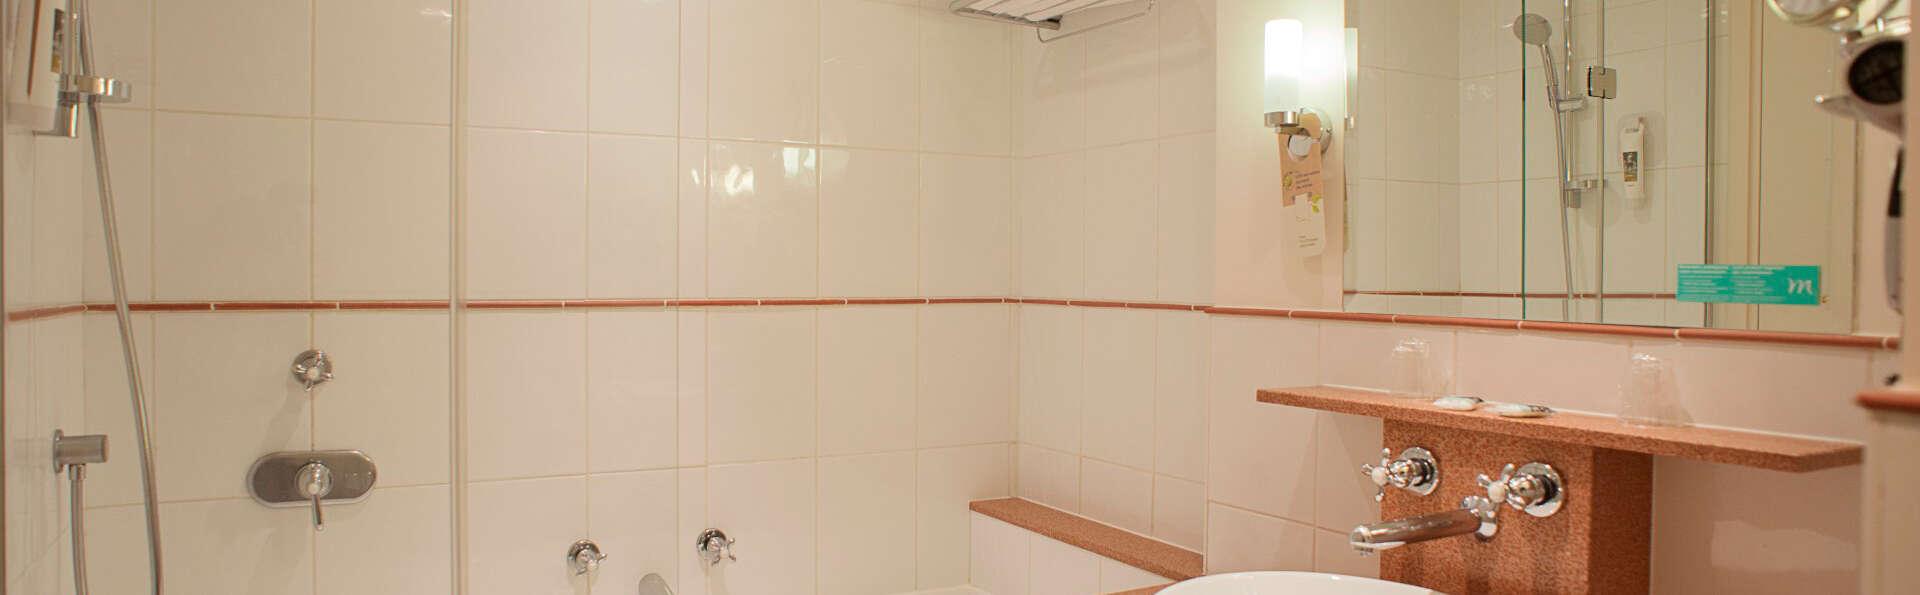 Mercure Grand Lille - EDIT_bath.jpg